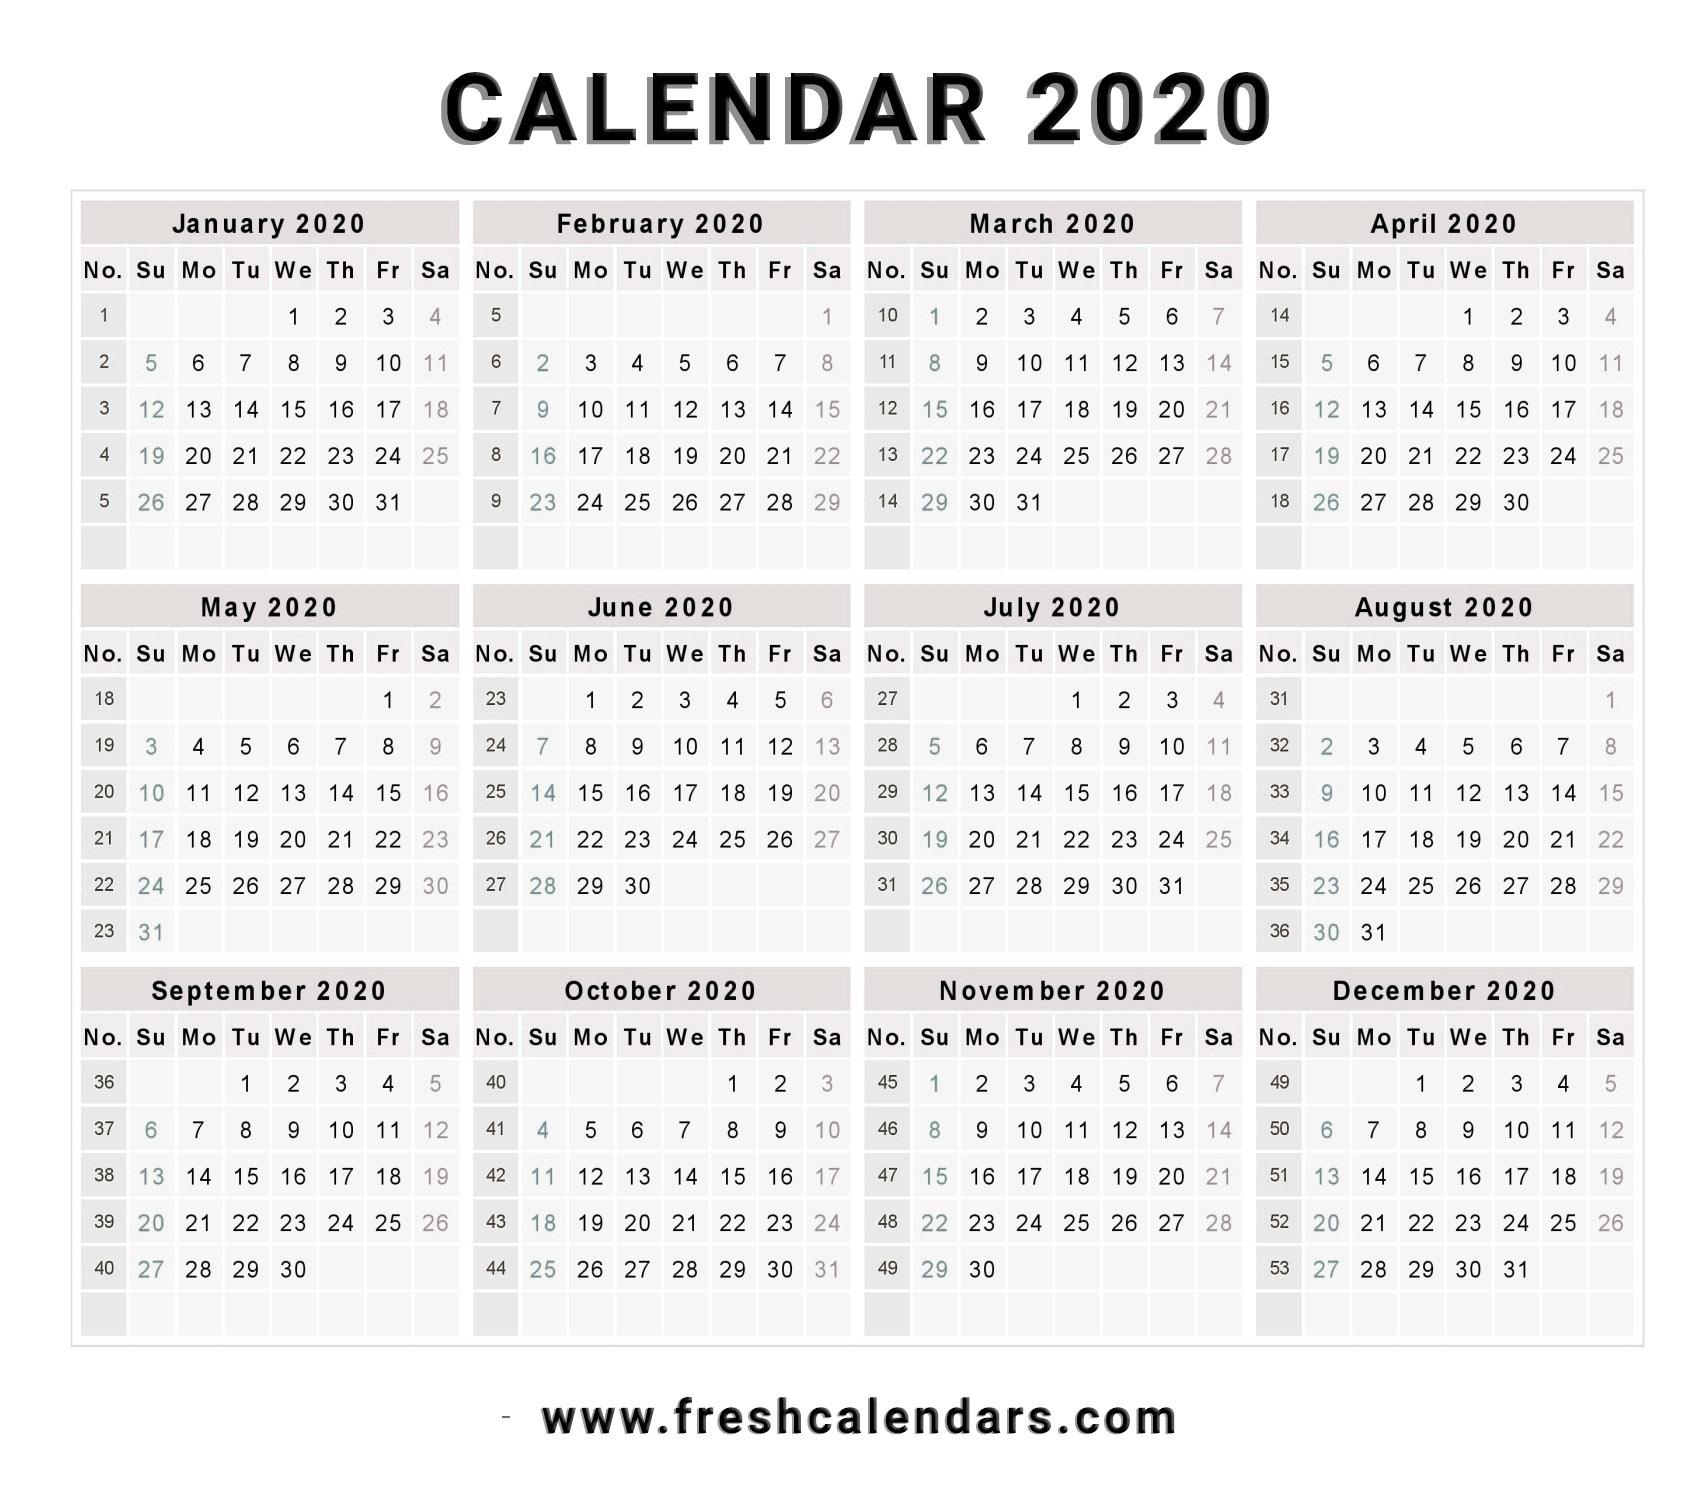 2020 Calendar pertaining to 2020 Calendar With Week Numbers In Excel